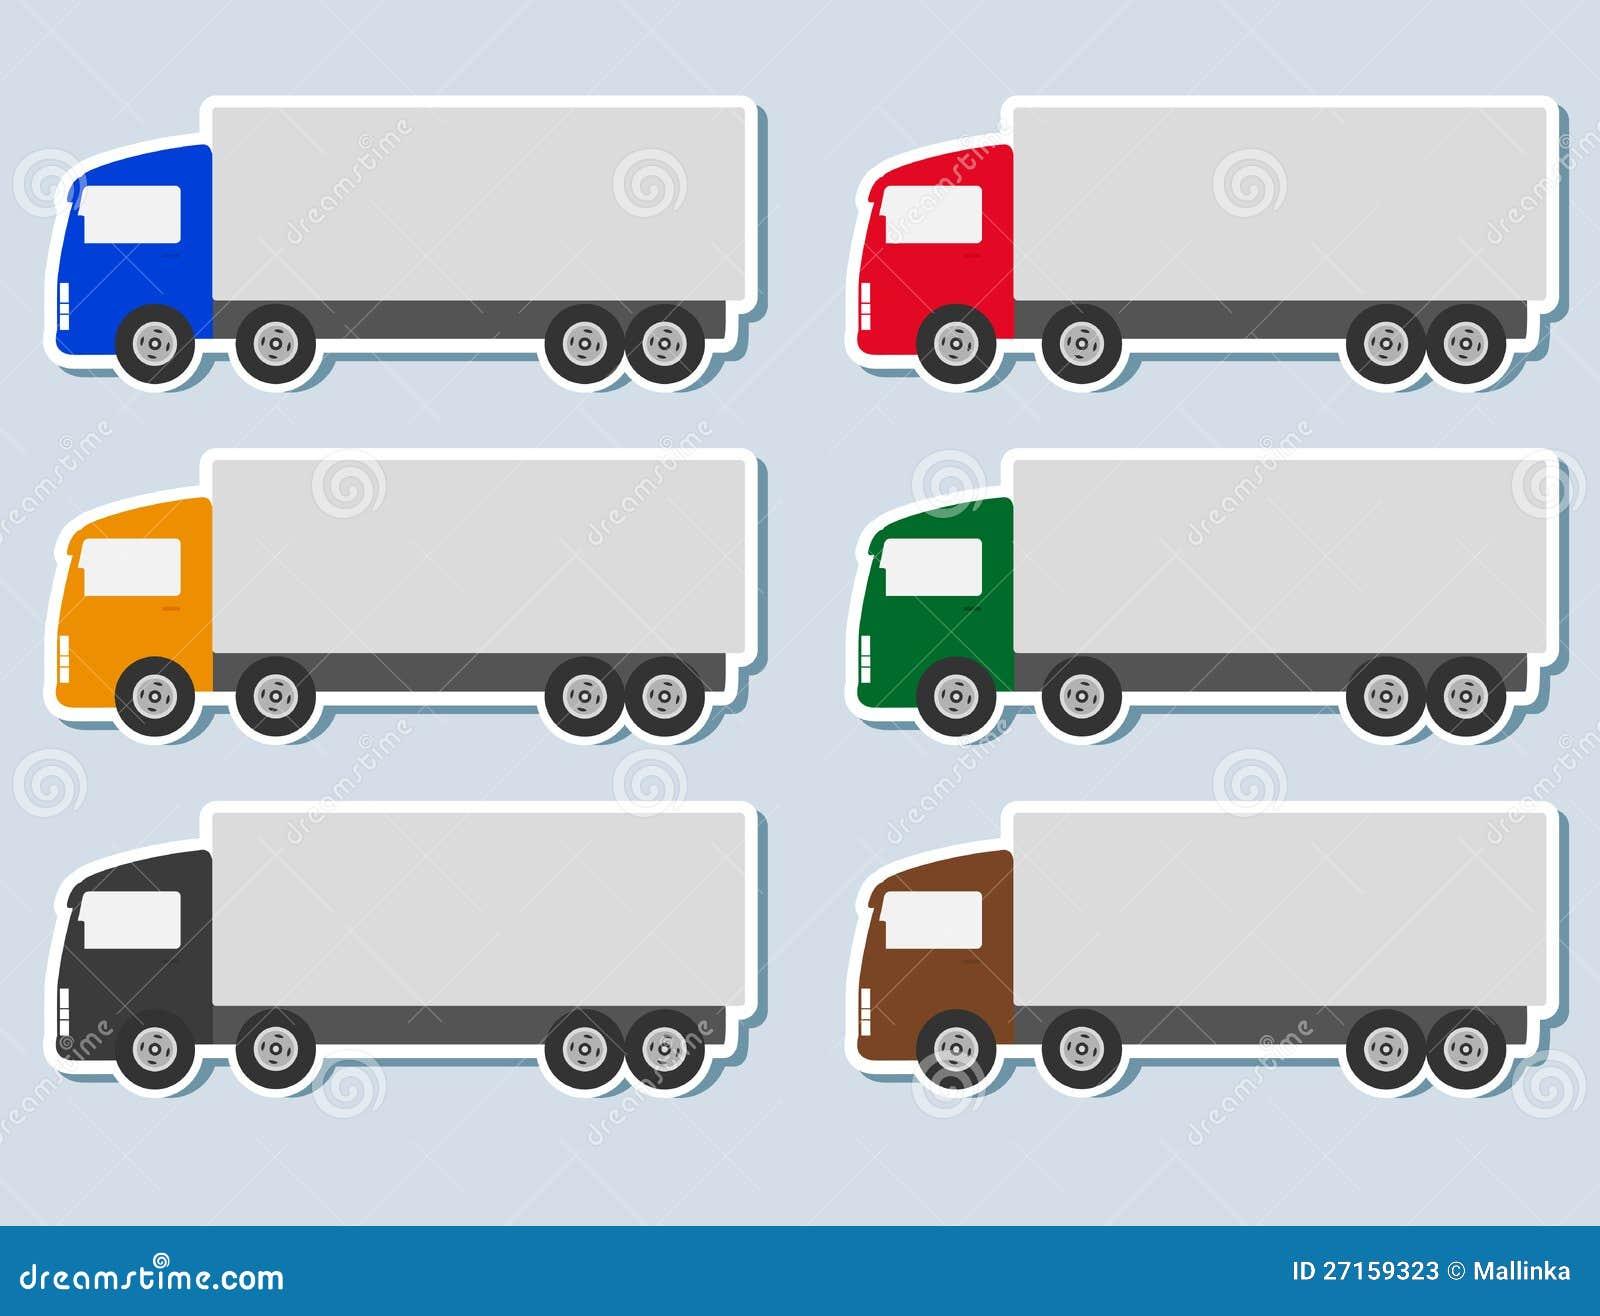 Semi Truck Silhouette Semi Truck Silhoue